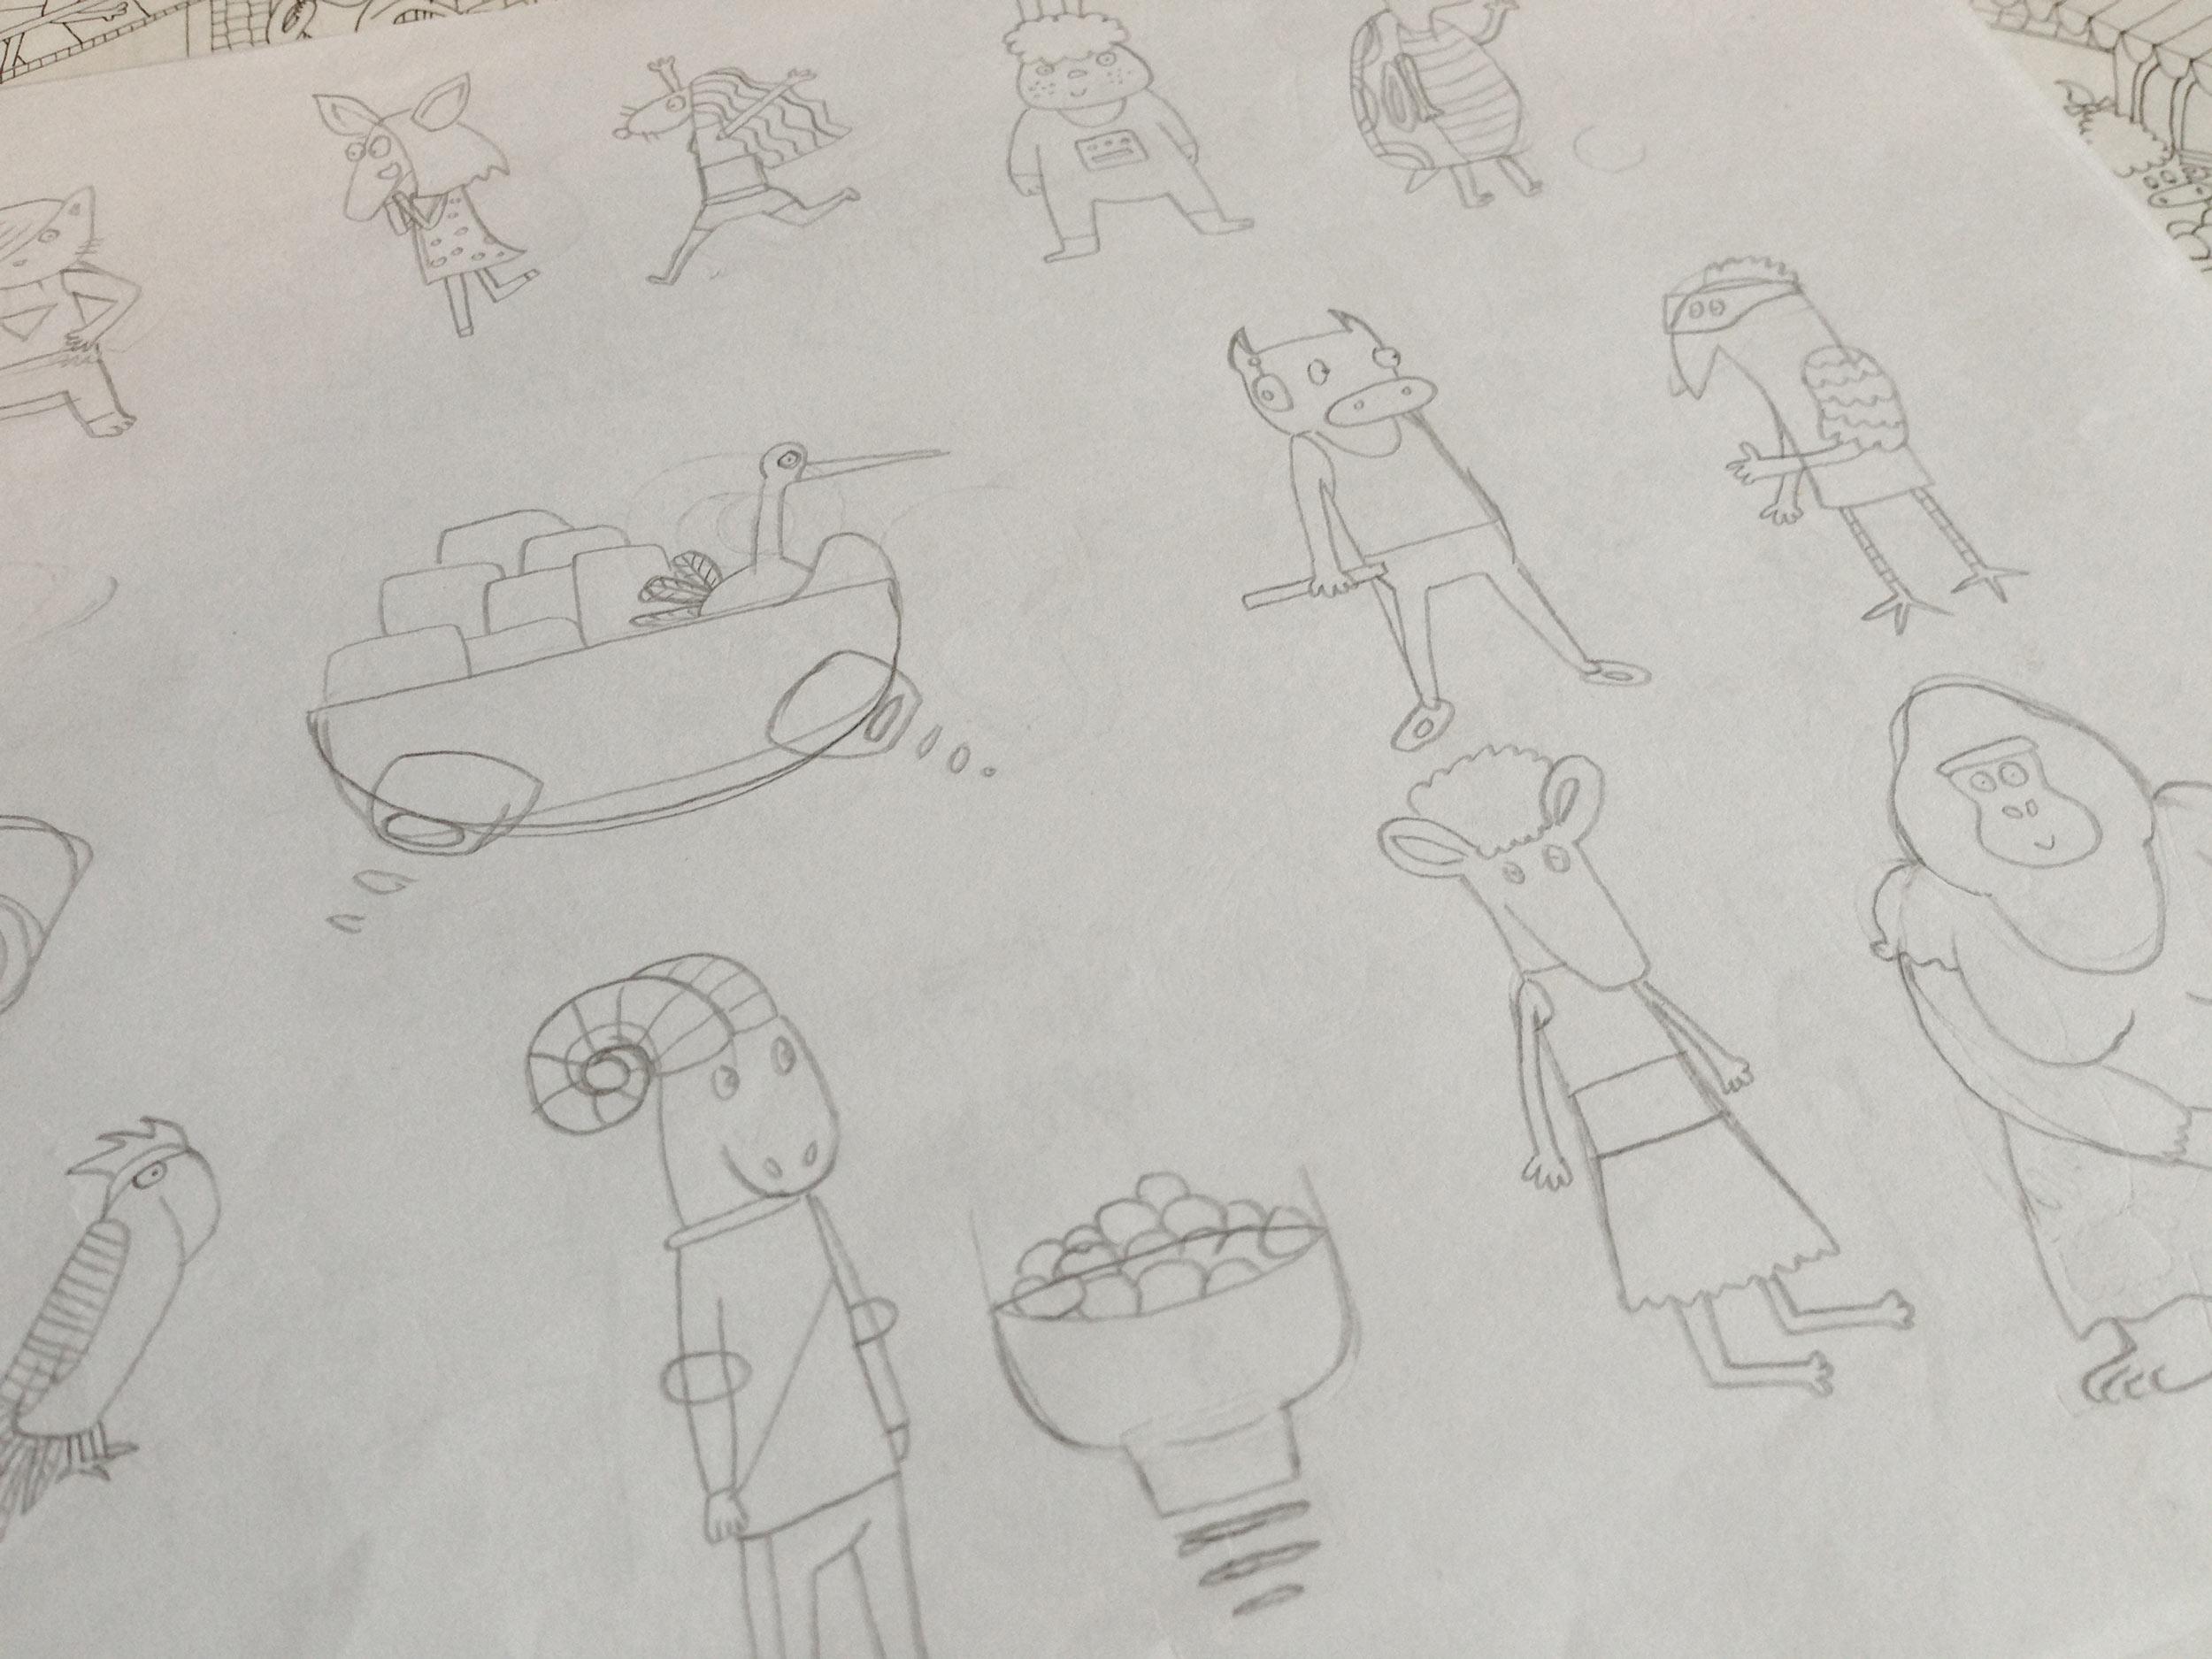 Sketching characters.